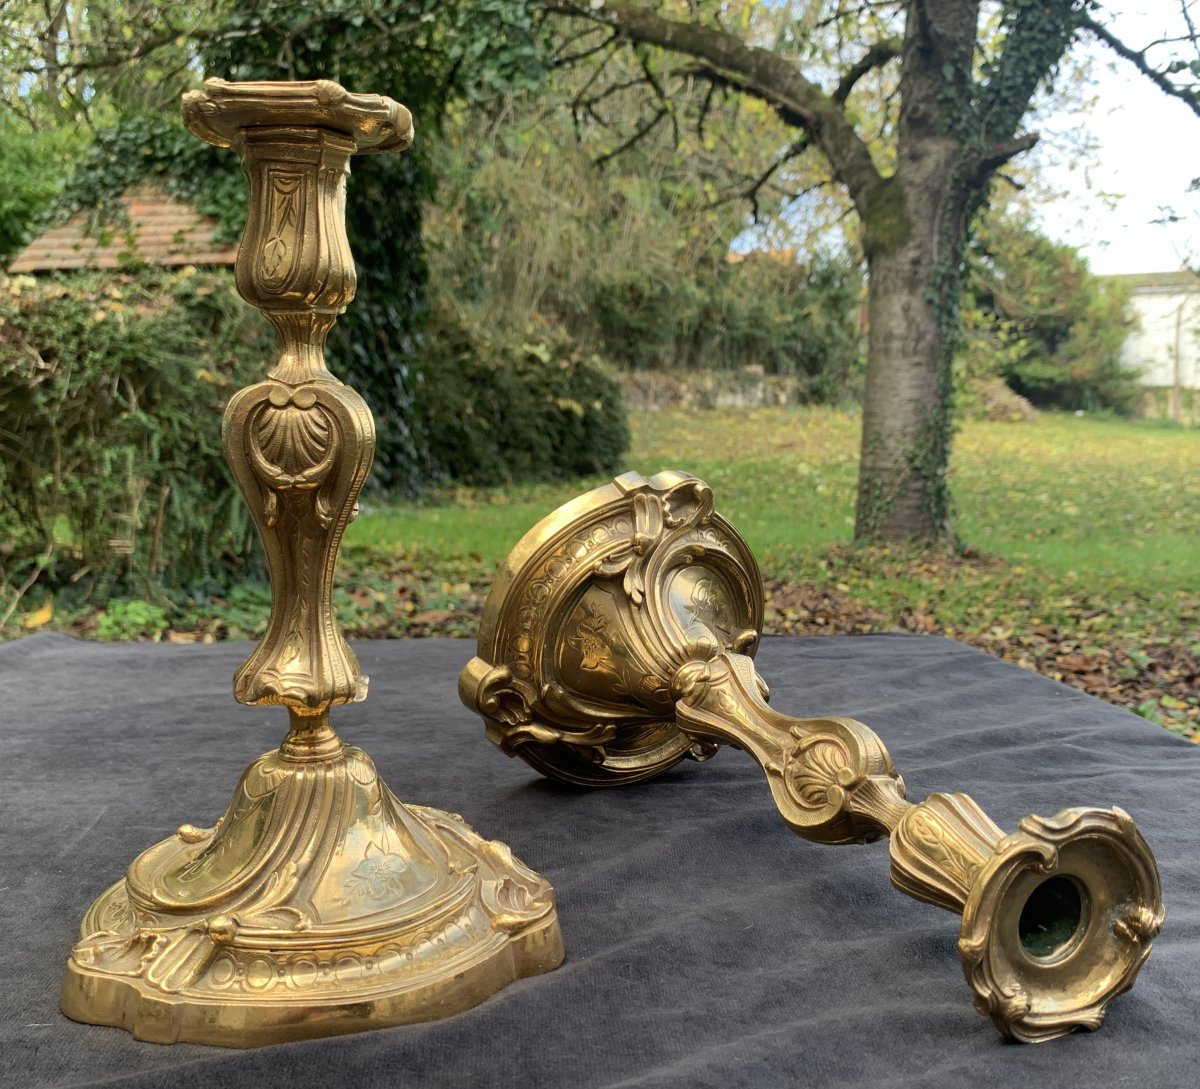 Superb Pair Of Louis XV Gilt Bronze Chiseled Candlesticks